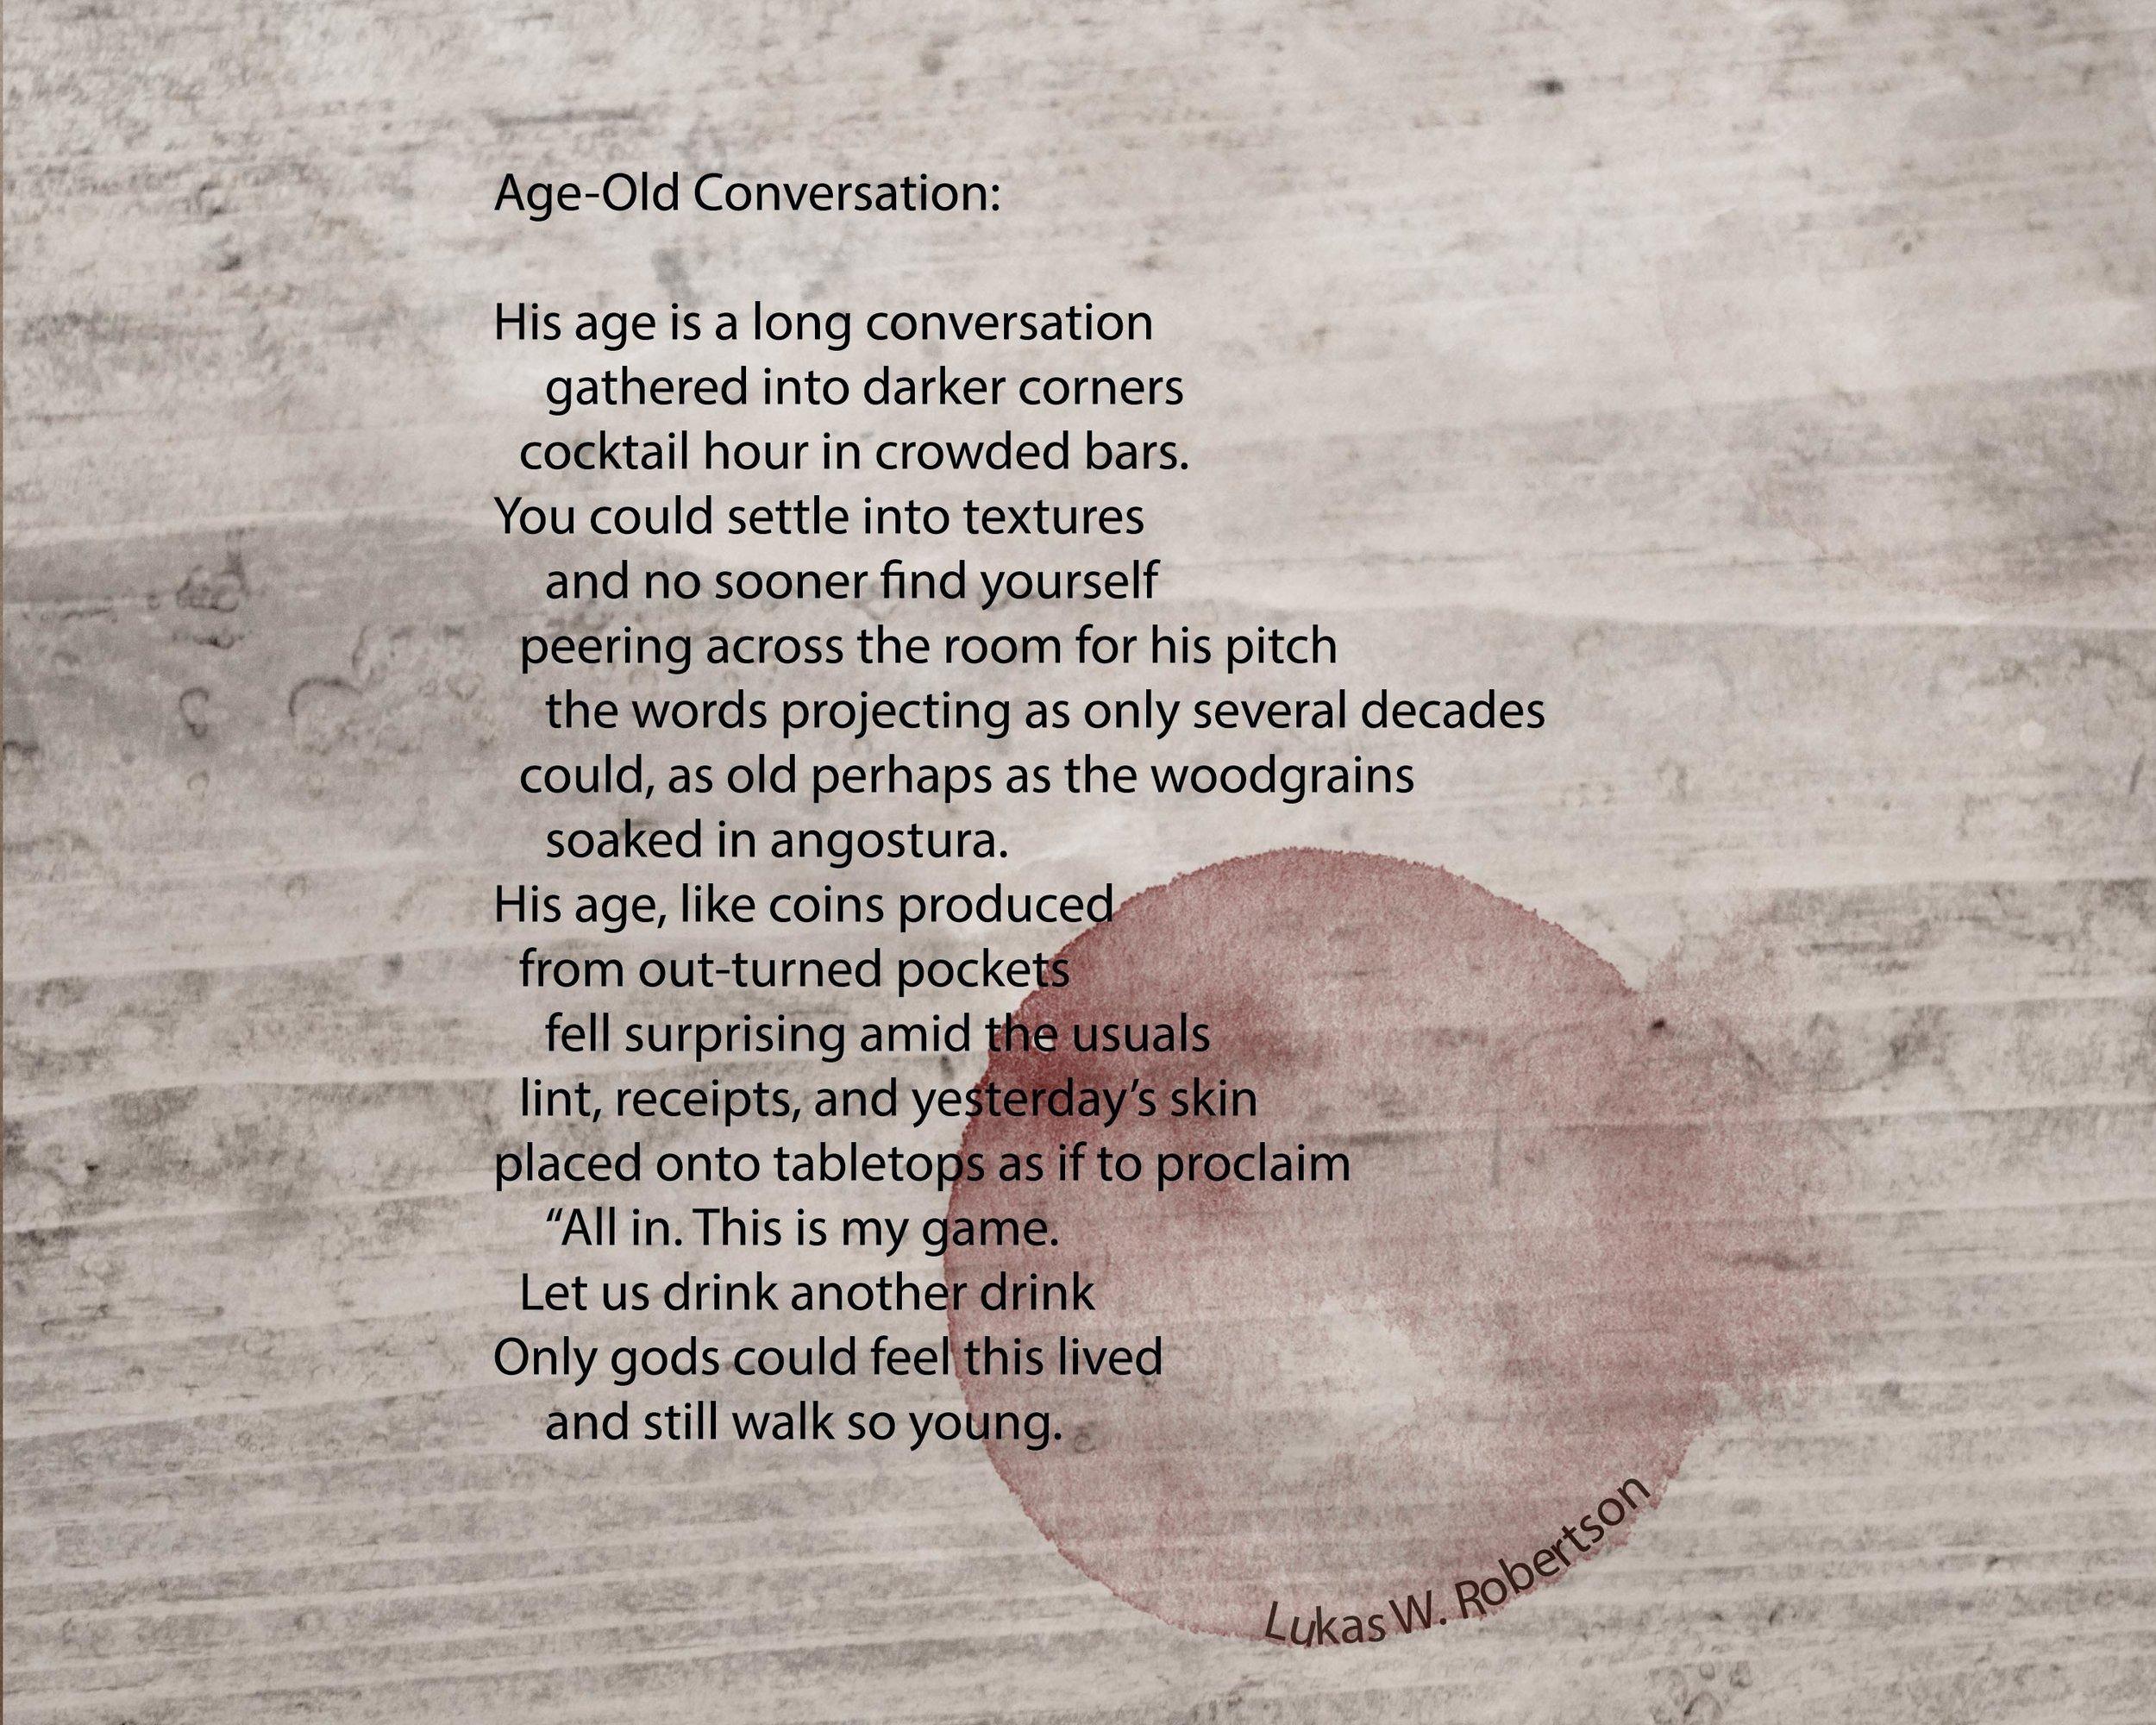 Age-Old-Conversation.jpg